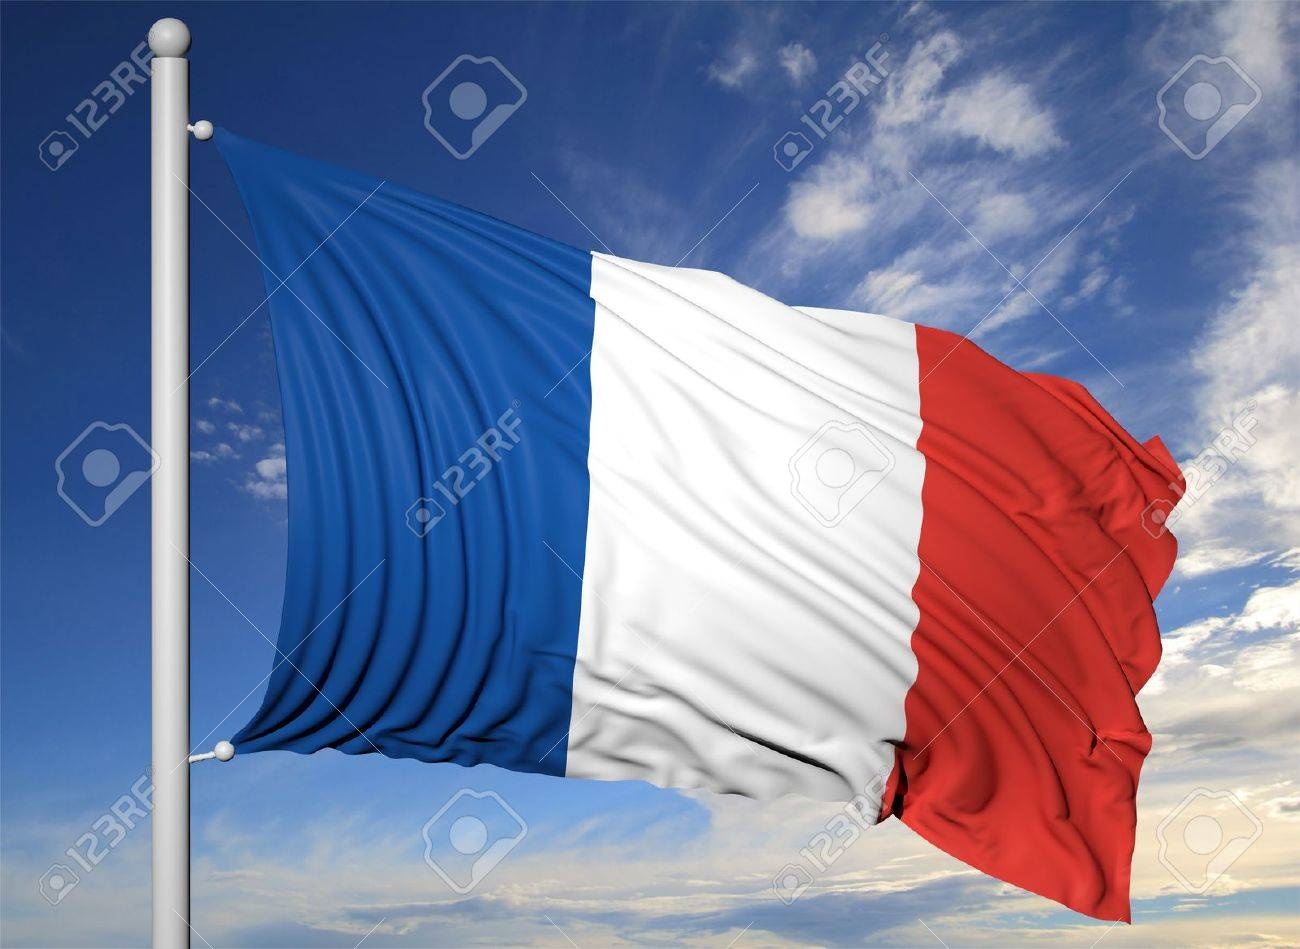 Waving flag of France on flagpole, on blue sky background. - 44876295